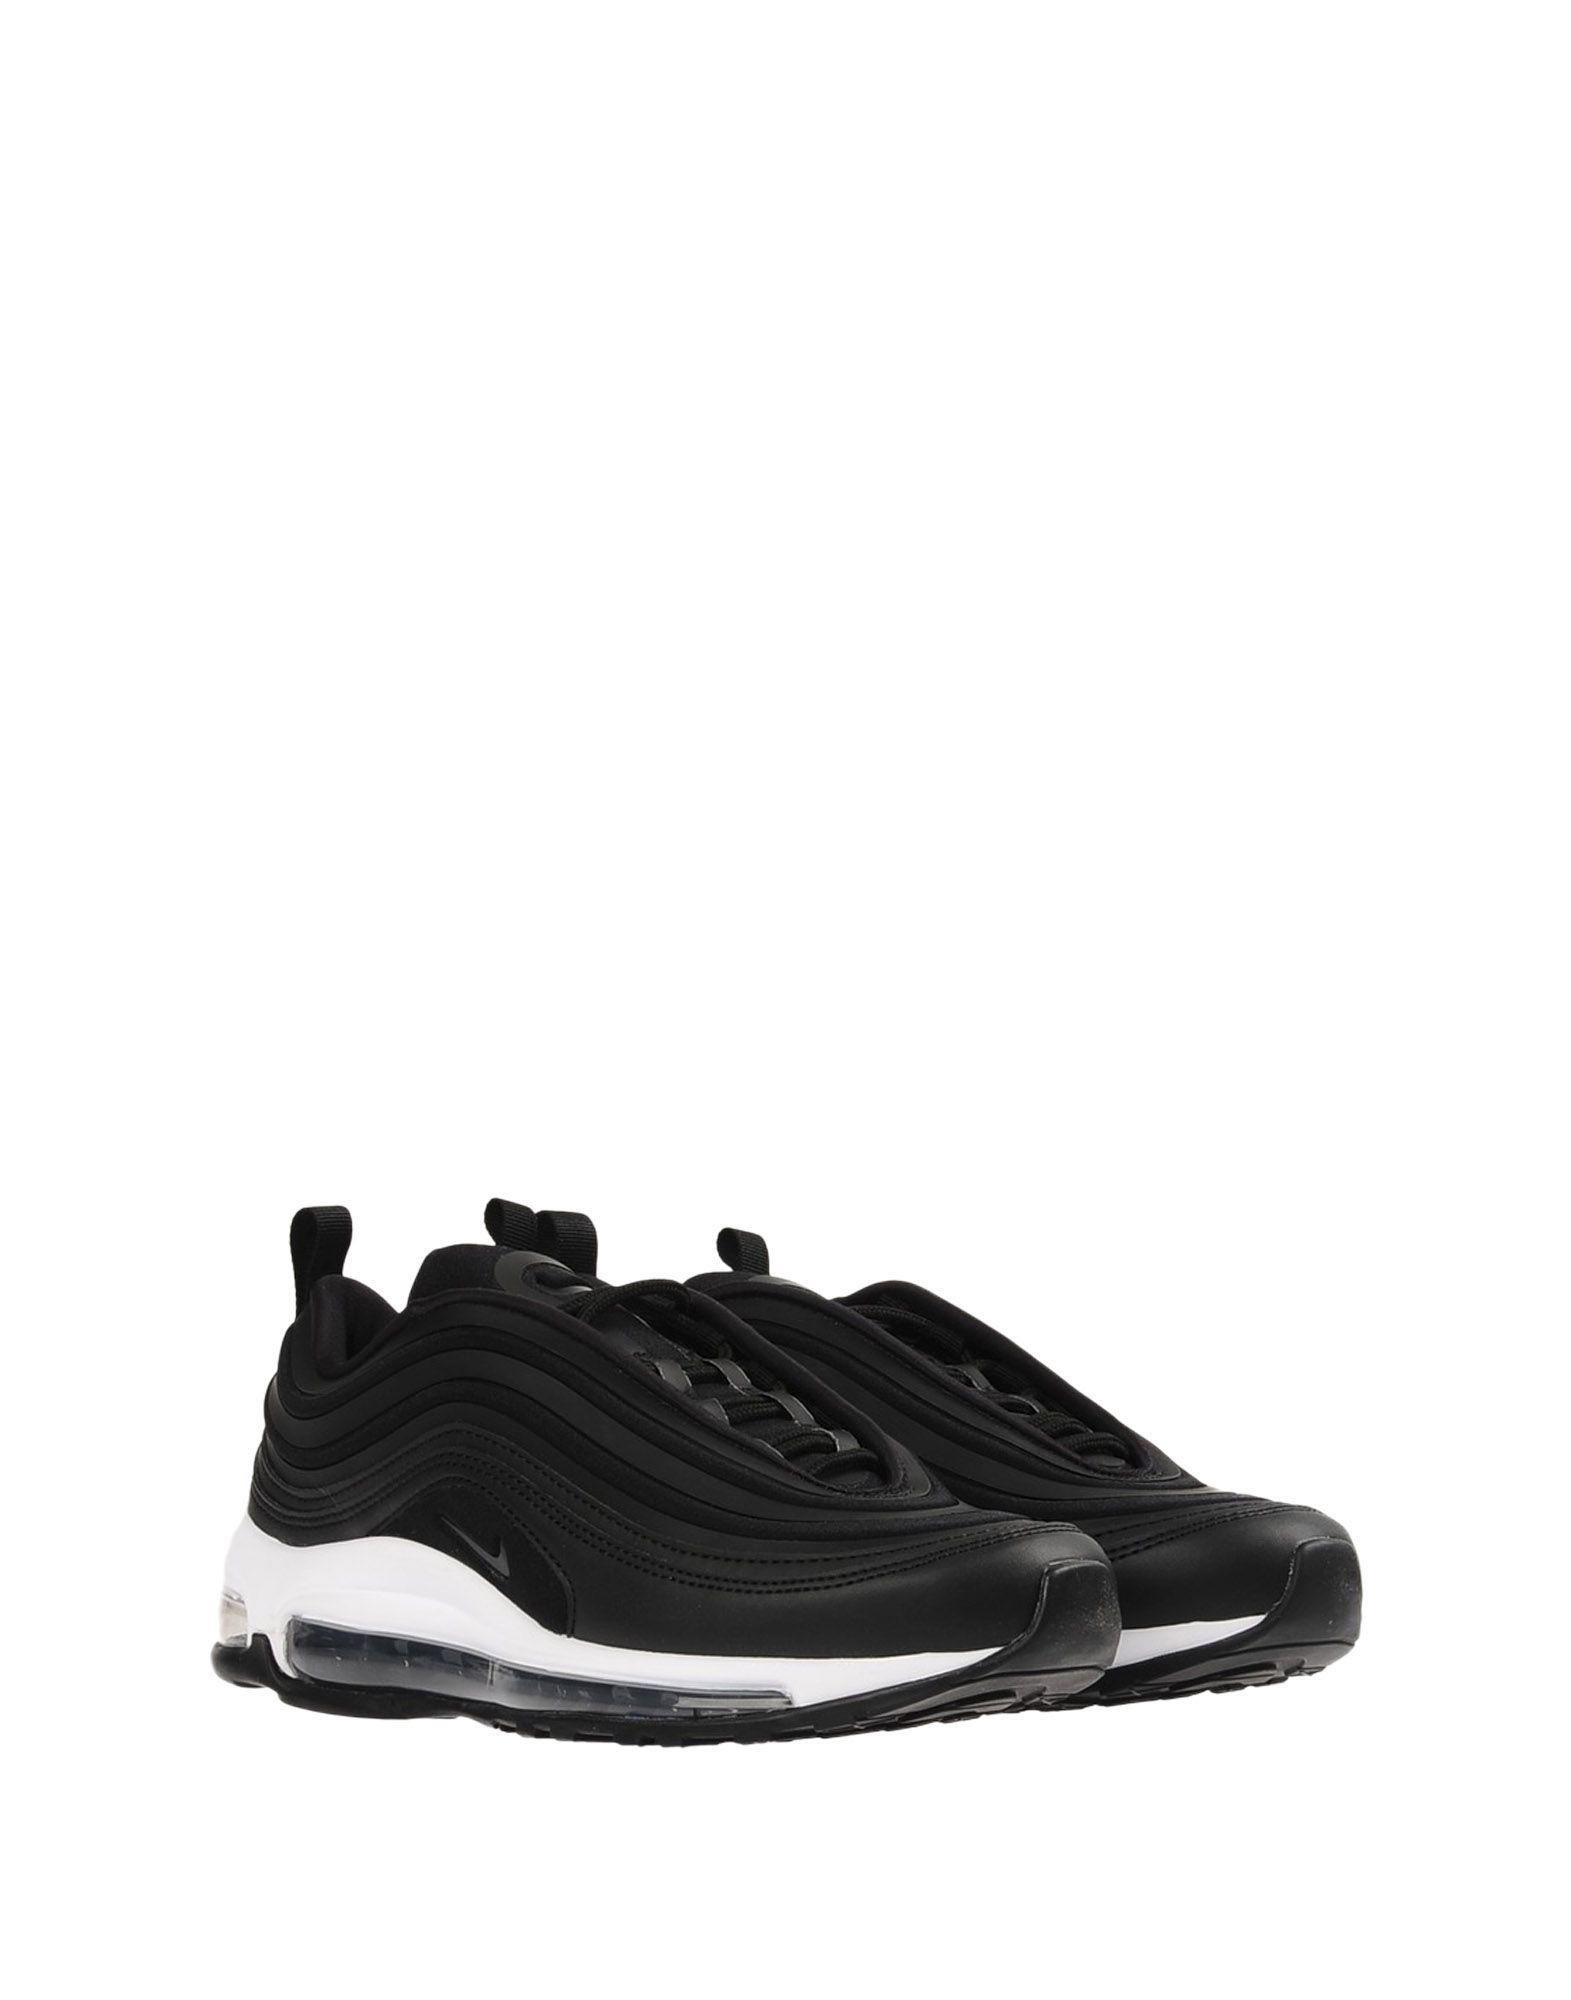 Haltbare Mode billige Schuhe 11457165CB Nike Air 11457165CB Schuhe Neue Schuhe 4fff17